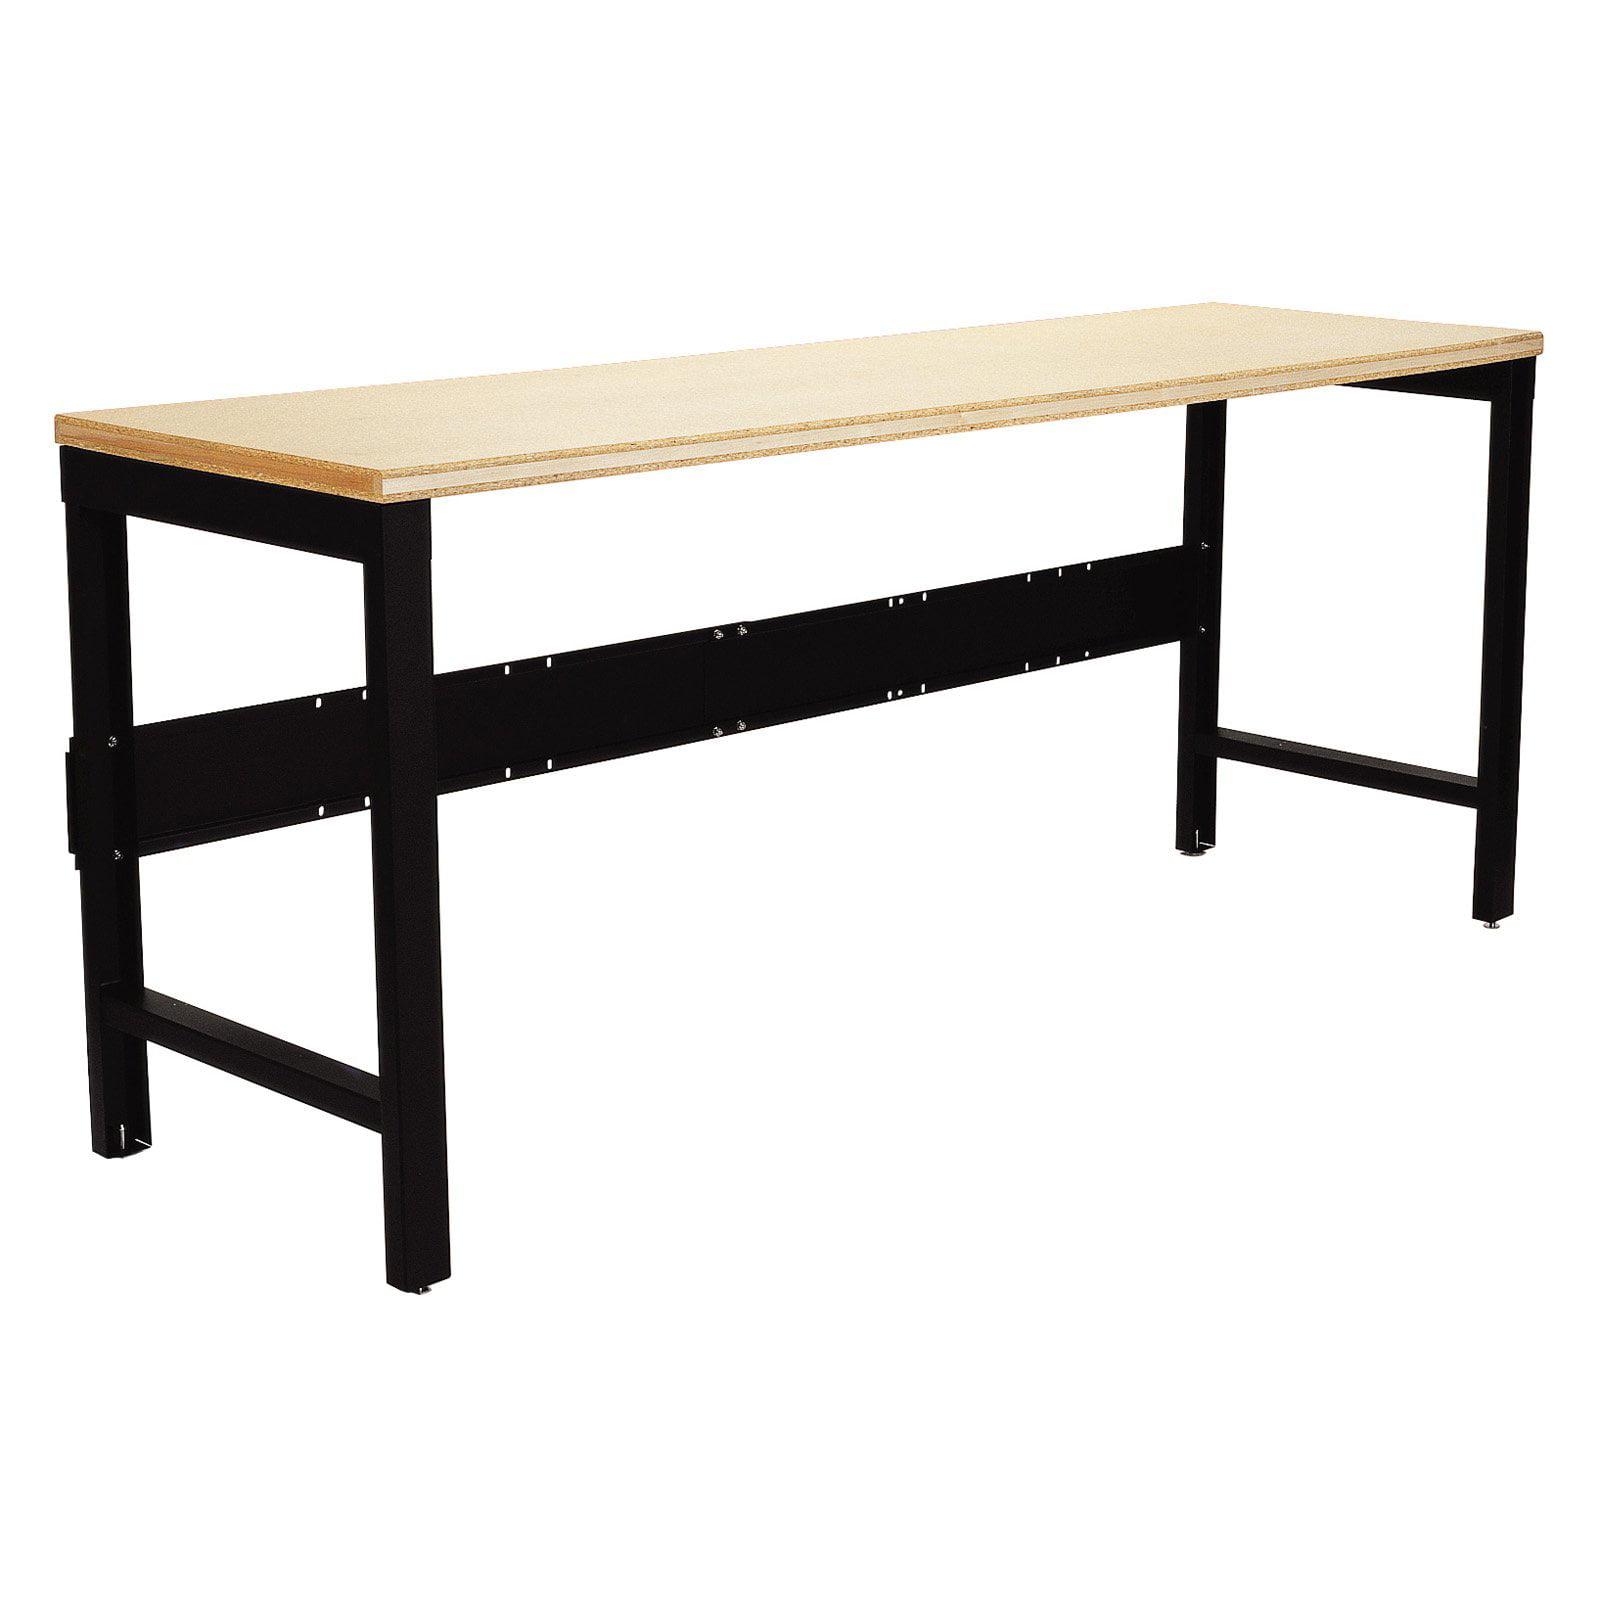 Edsal Steel Workbench with Wood Top